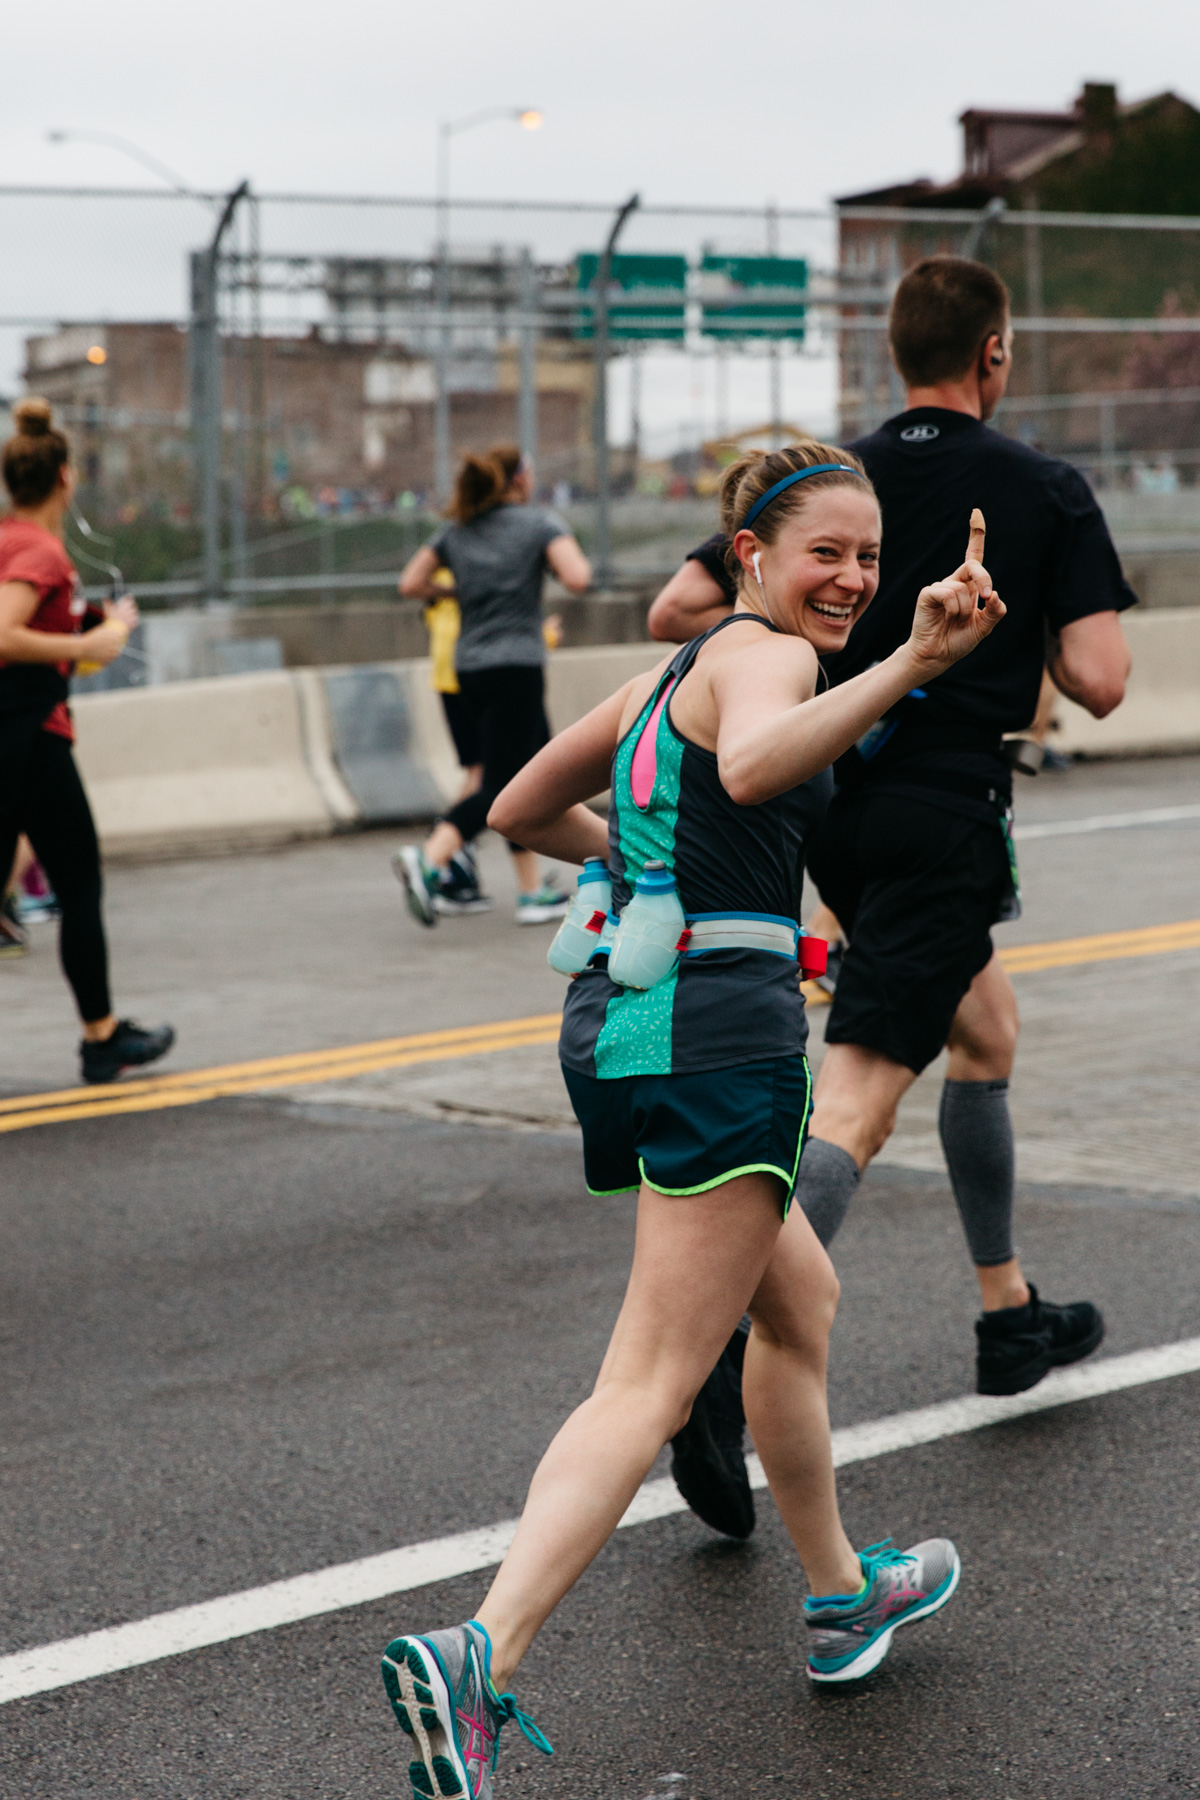 Our friends, Matt and Dana, running the full marathon, at Mile 3.